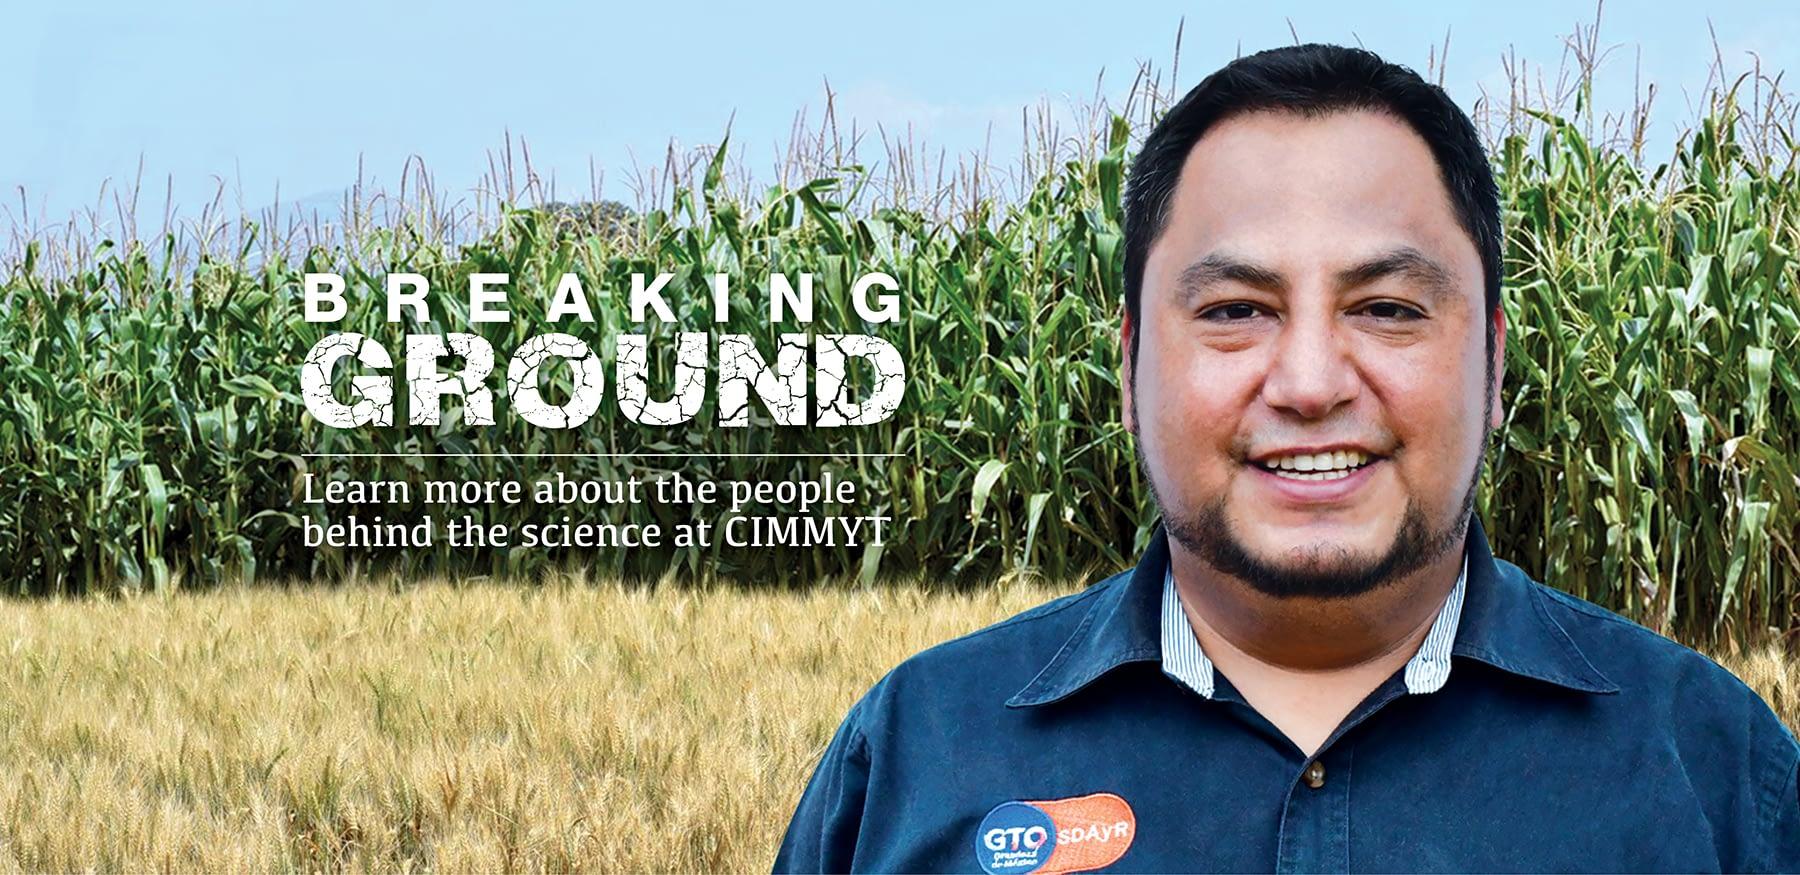 Ortiz Hernández, manager of CIMMYT's innovation hub in Bajío, Mexico. (Photo: CIMMYT)